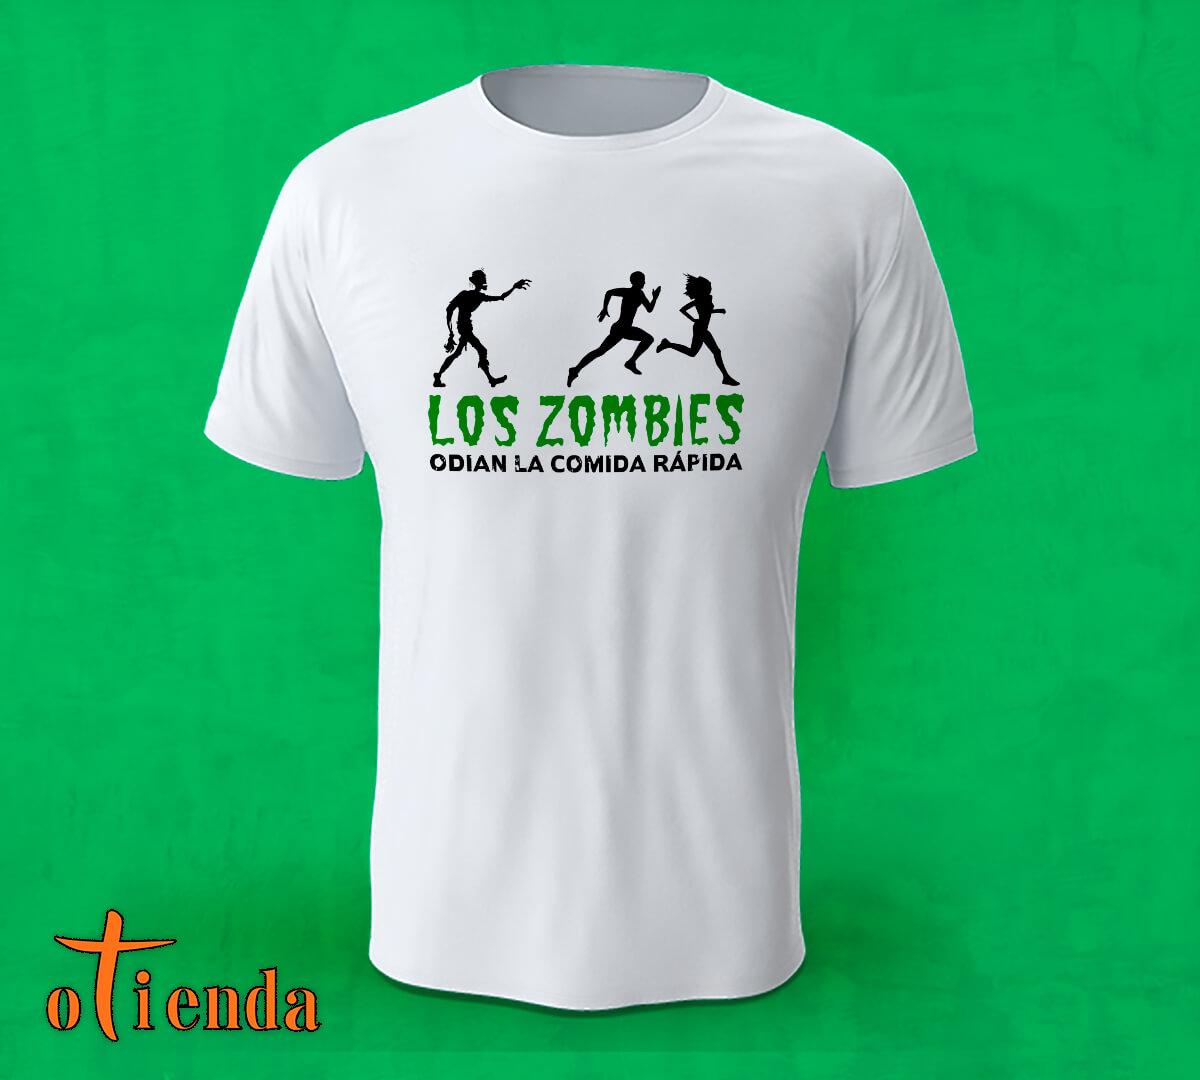 Camiseta Zombie personalizada